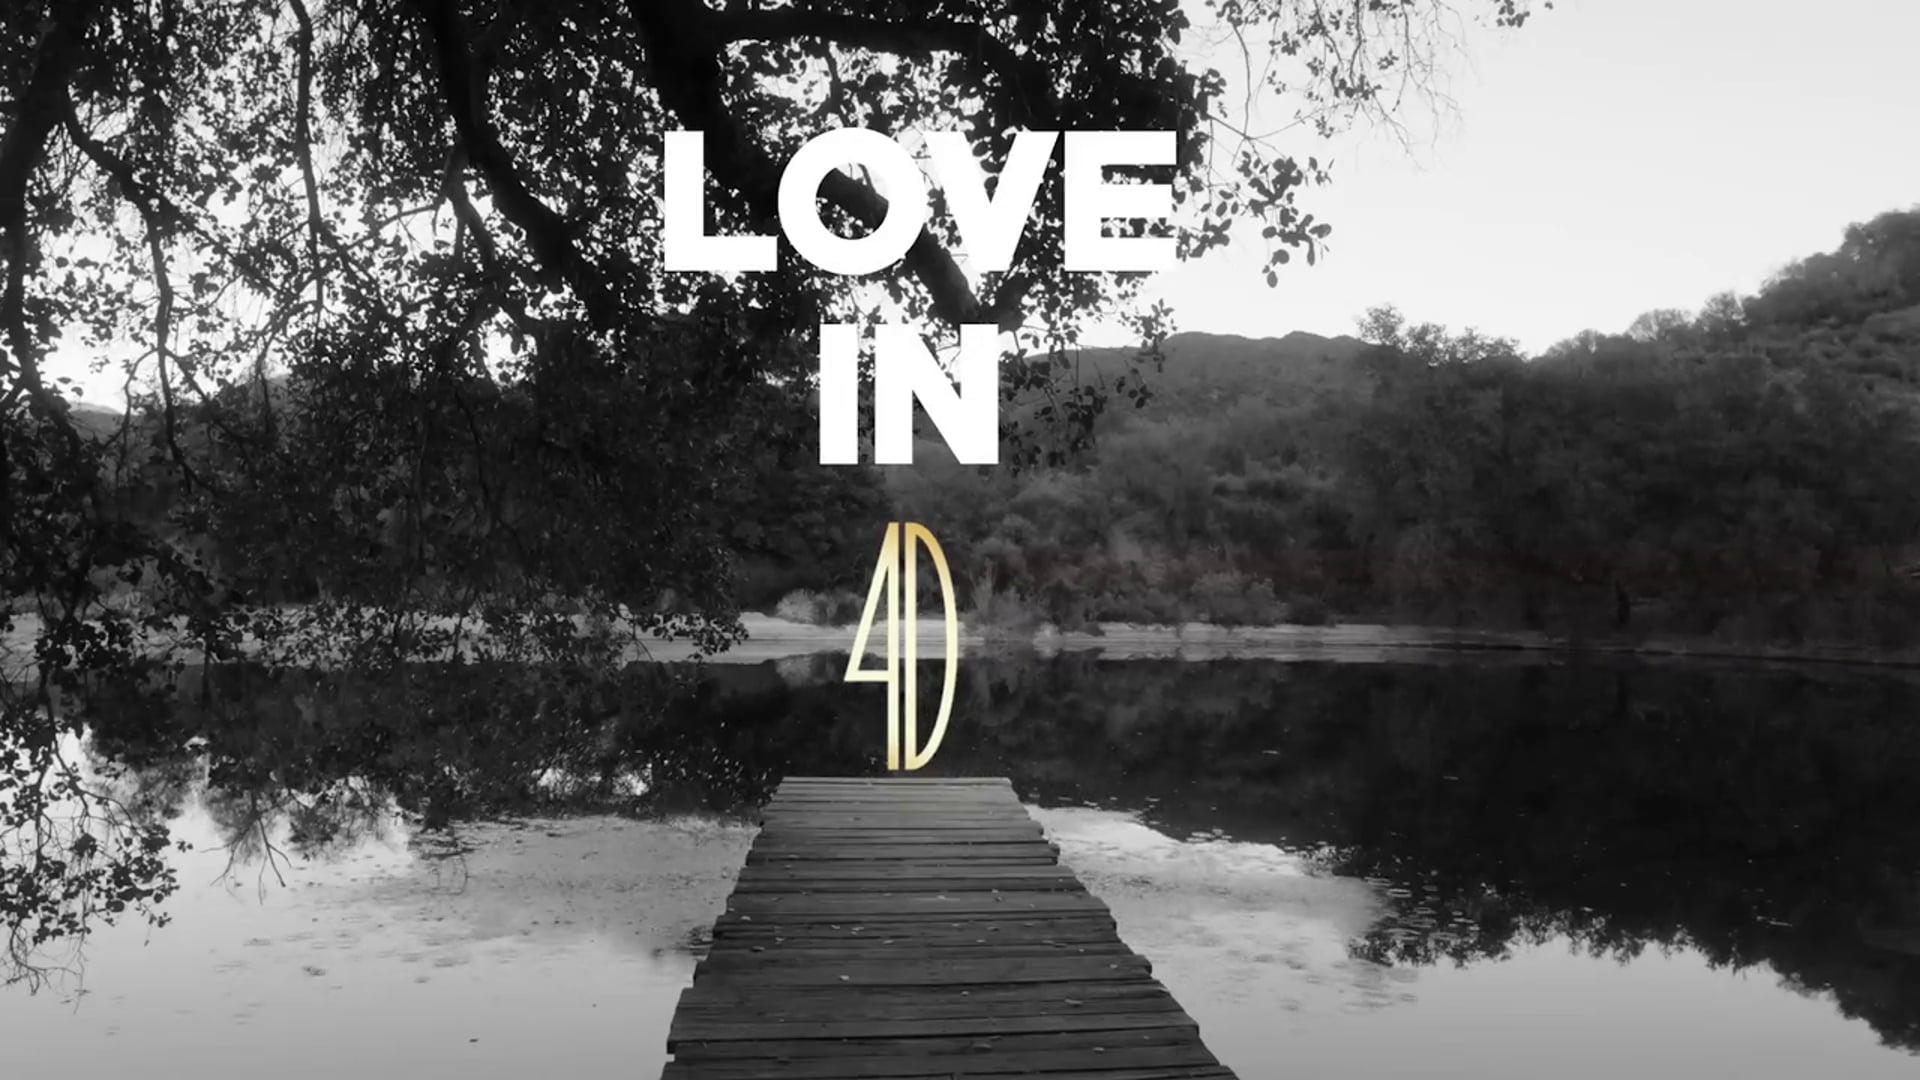 LOVE in 4D - A FRAGRANCE FILM by DANIELLA PARFUMS